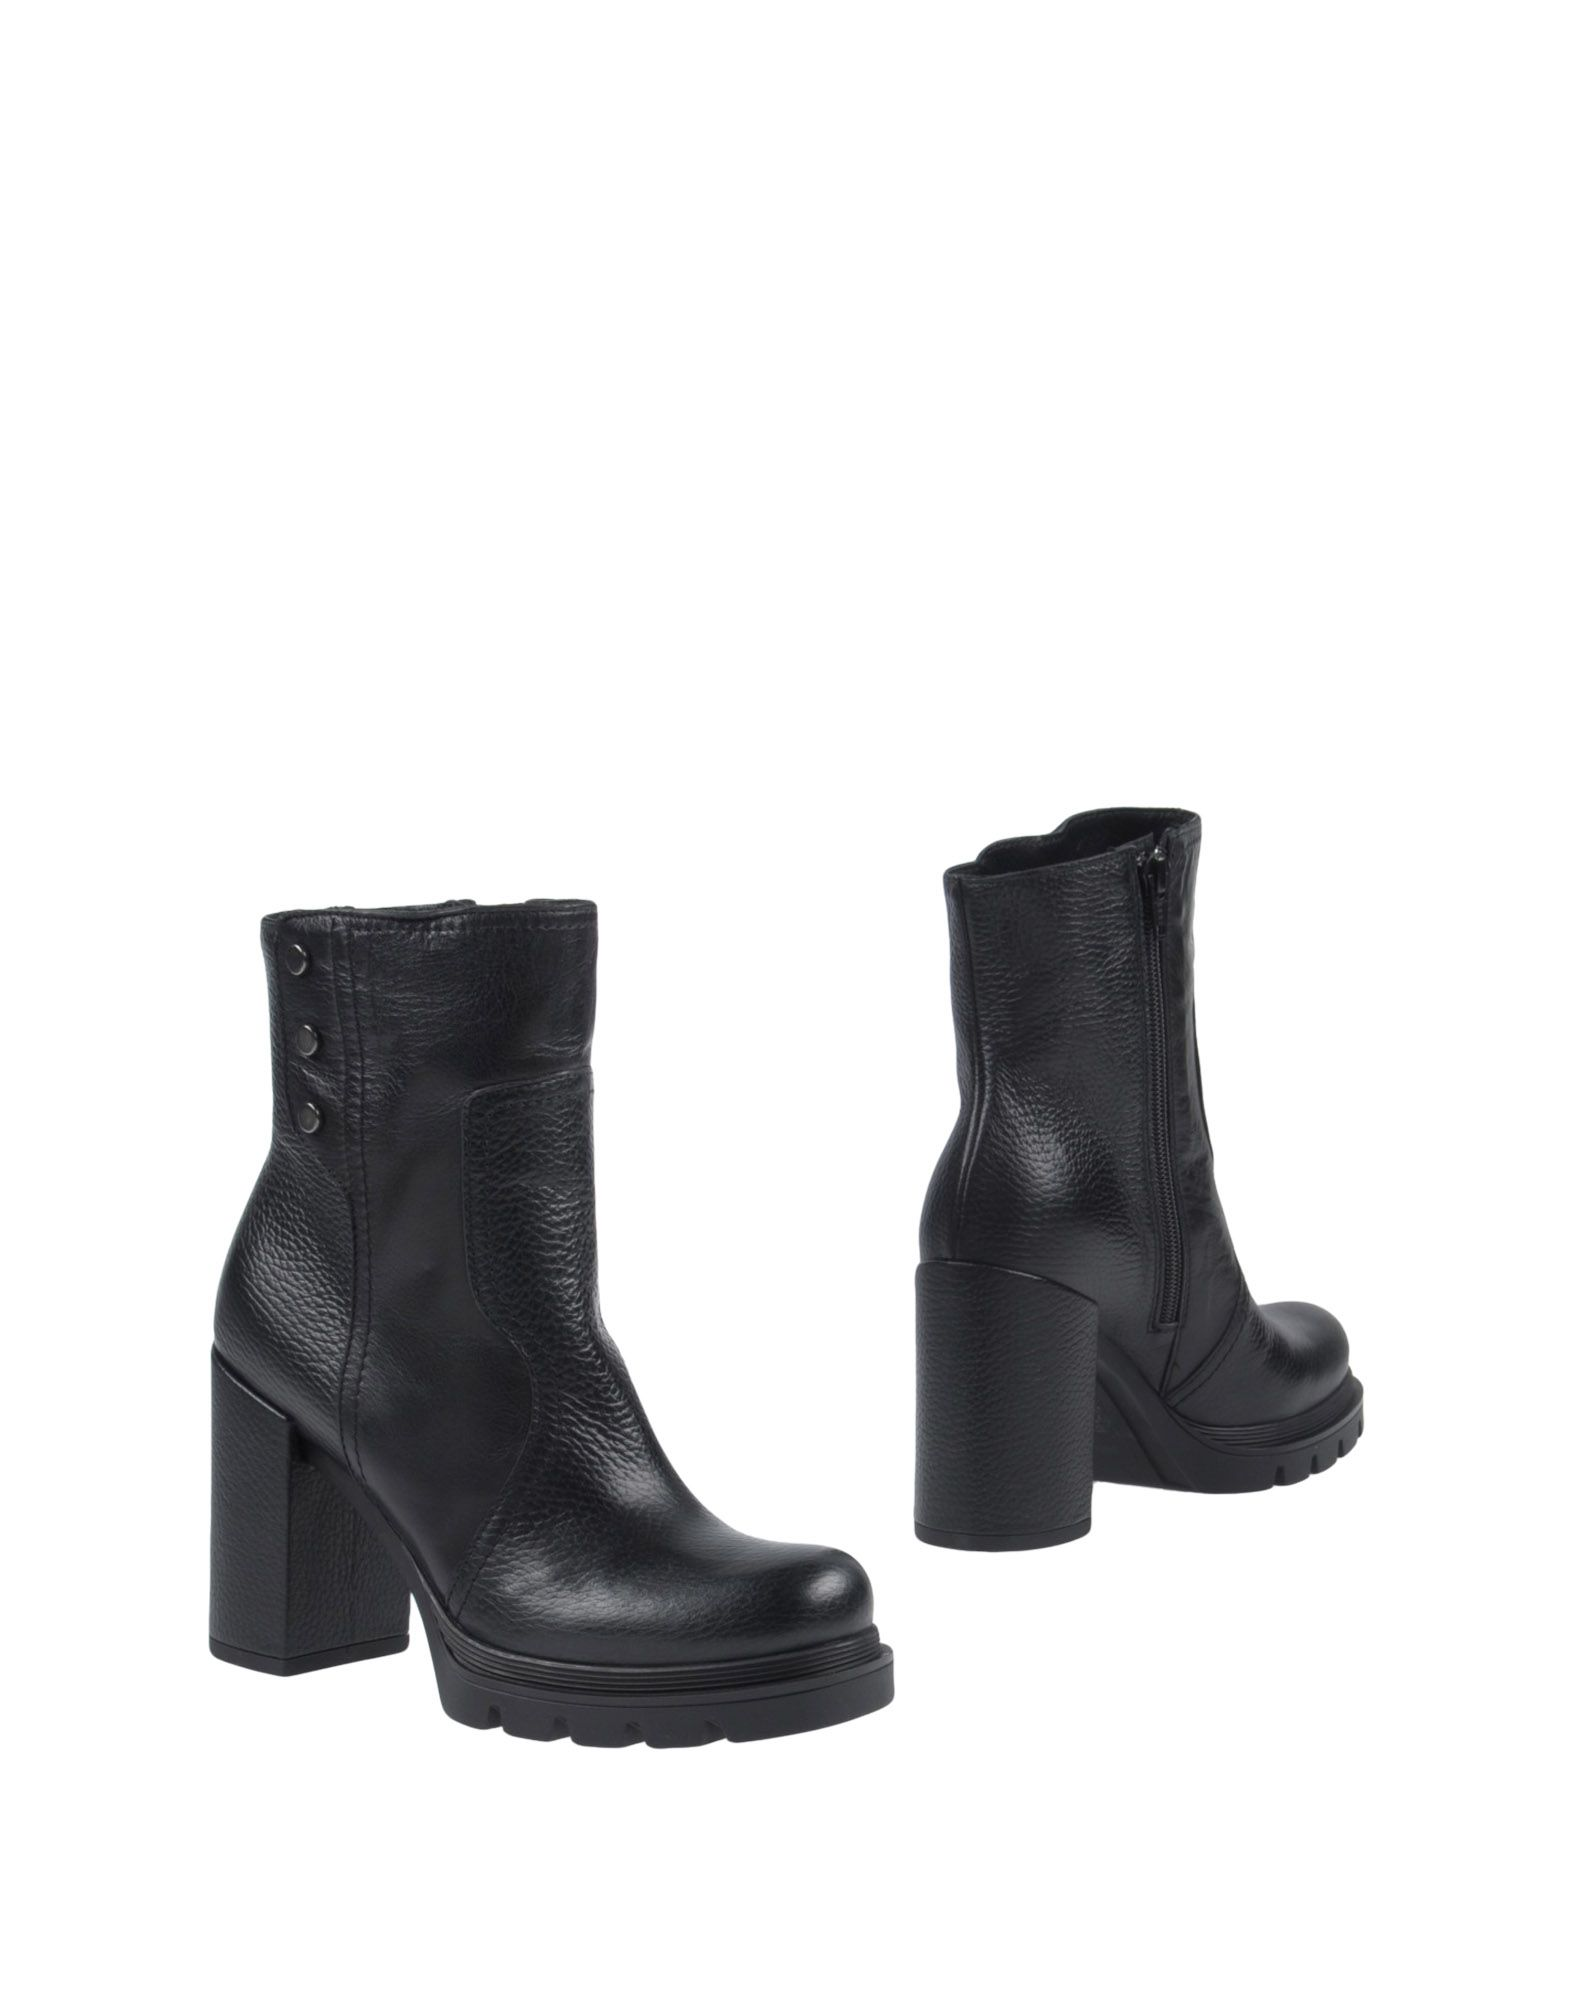 Bottine Emanuela Passeri Femme - Bottines Emanuela Passeri Noir Chaussures casual sauvages